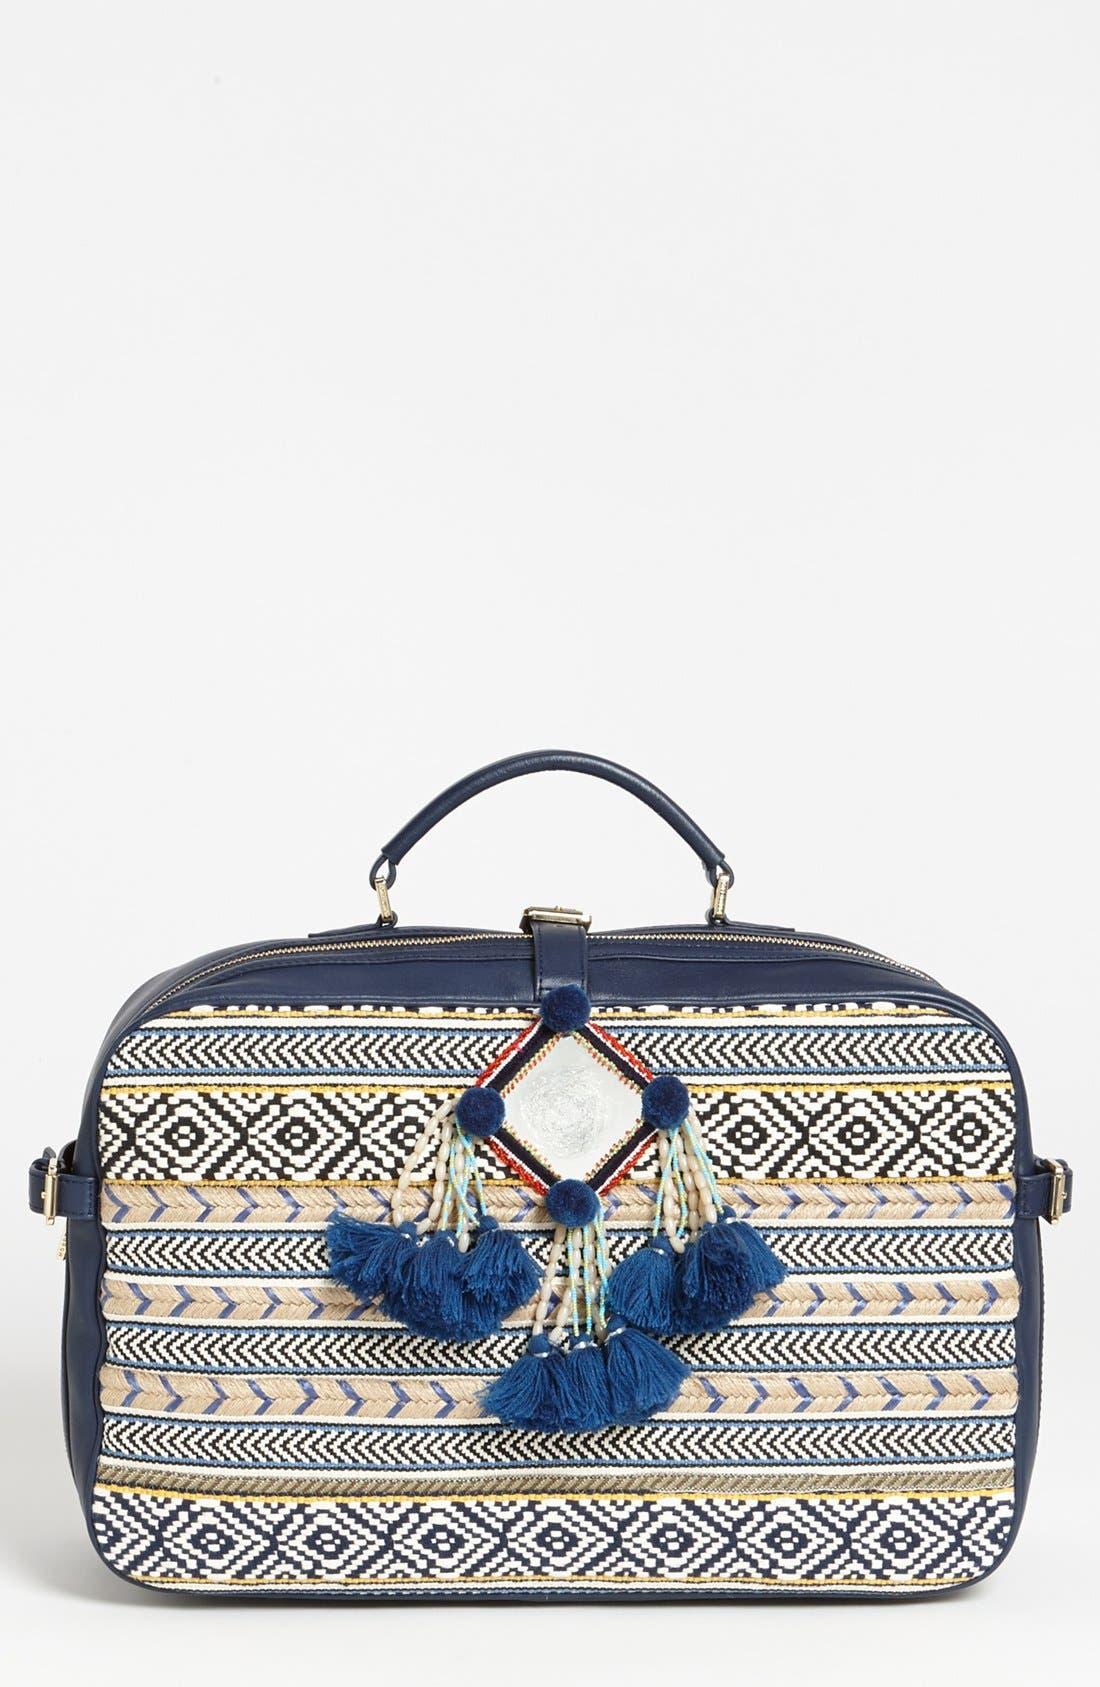 Main Image - Tory Burch 'Priscilla Mochilla' Suitcase Satchel